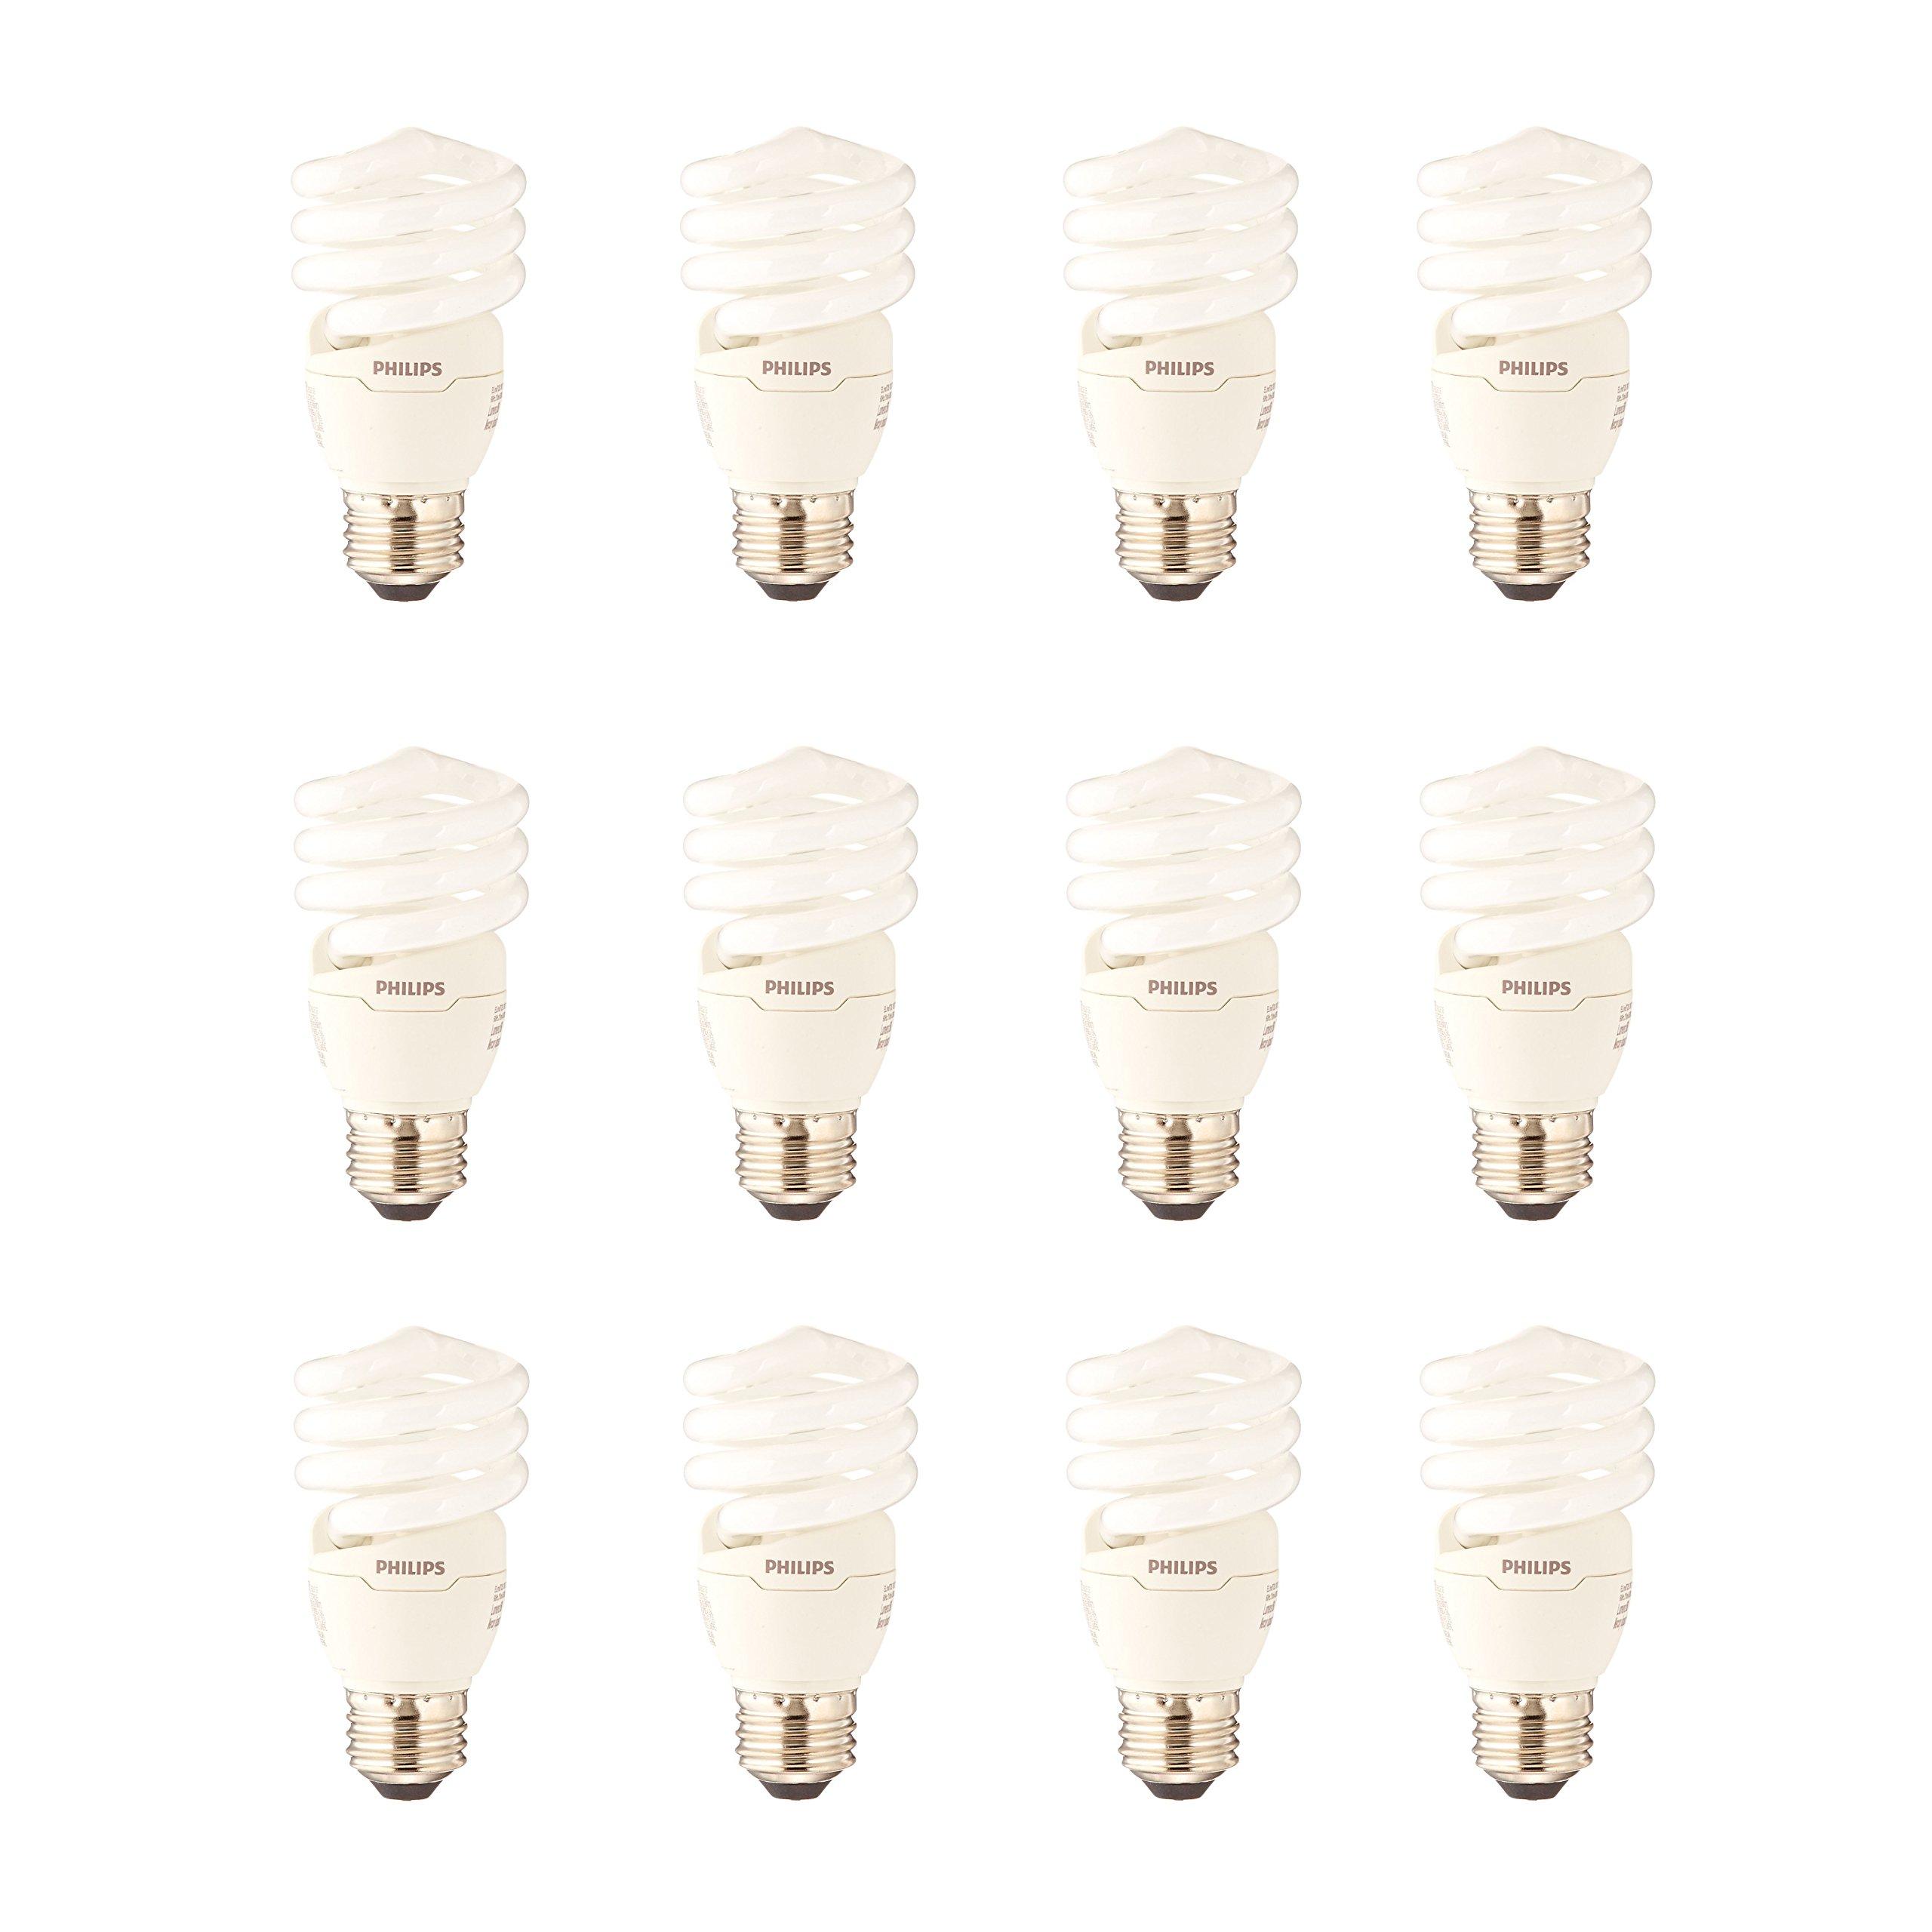 Philips CFL Light Bulb 13W T2 Twister Daylight 6500K, 60 Watt Equivalent (12 Pack)